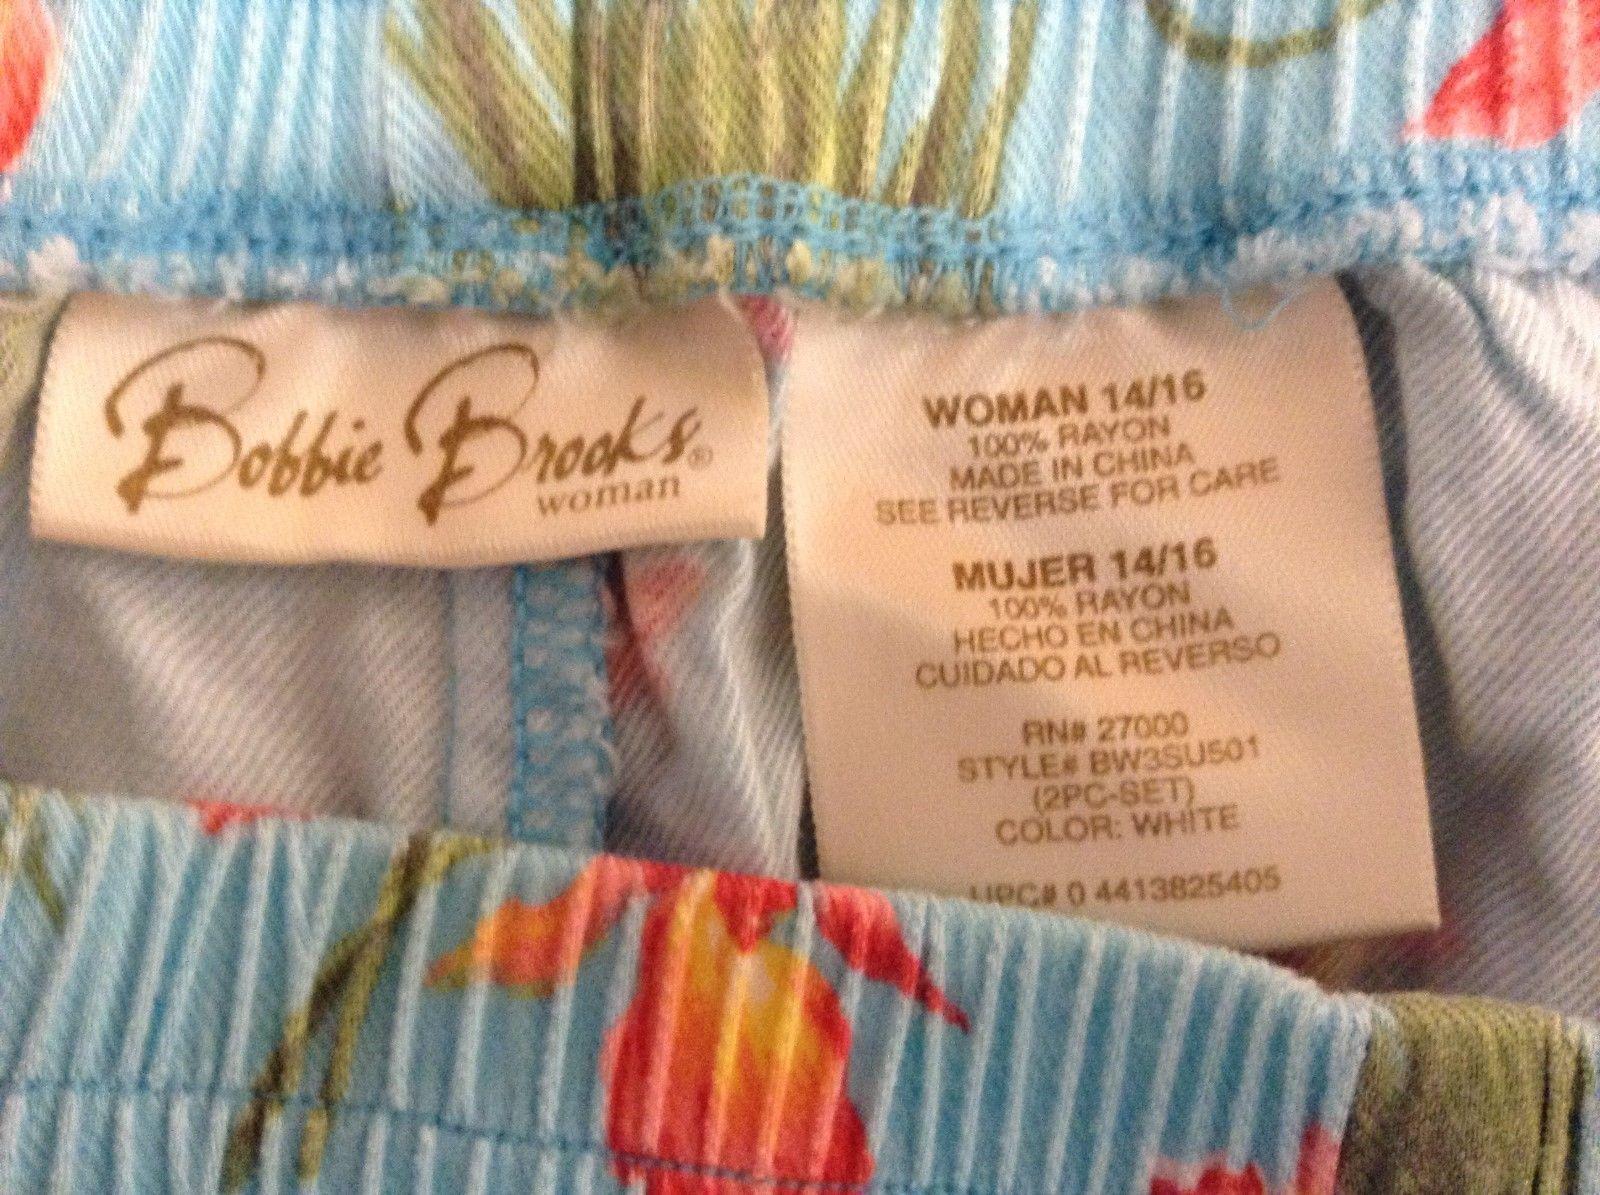 Bobbie Brooks Lt Blue Floral Pattern Shorts Sz 14/16